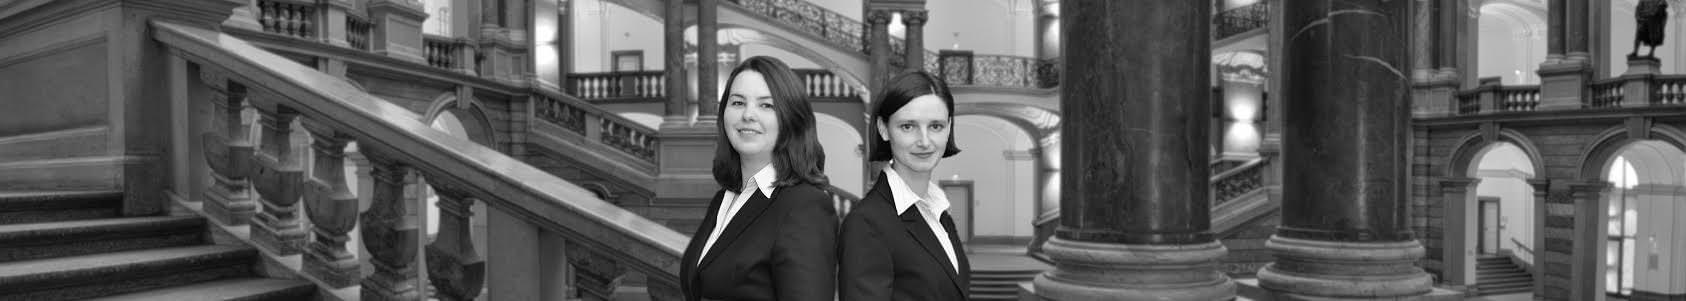 Anwalt Kapitalanlagerecht, Bankrecht, Aktienrecht, Versicherungsrecht München